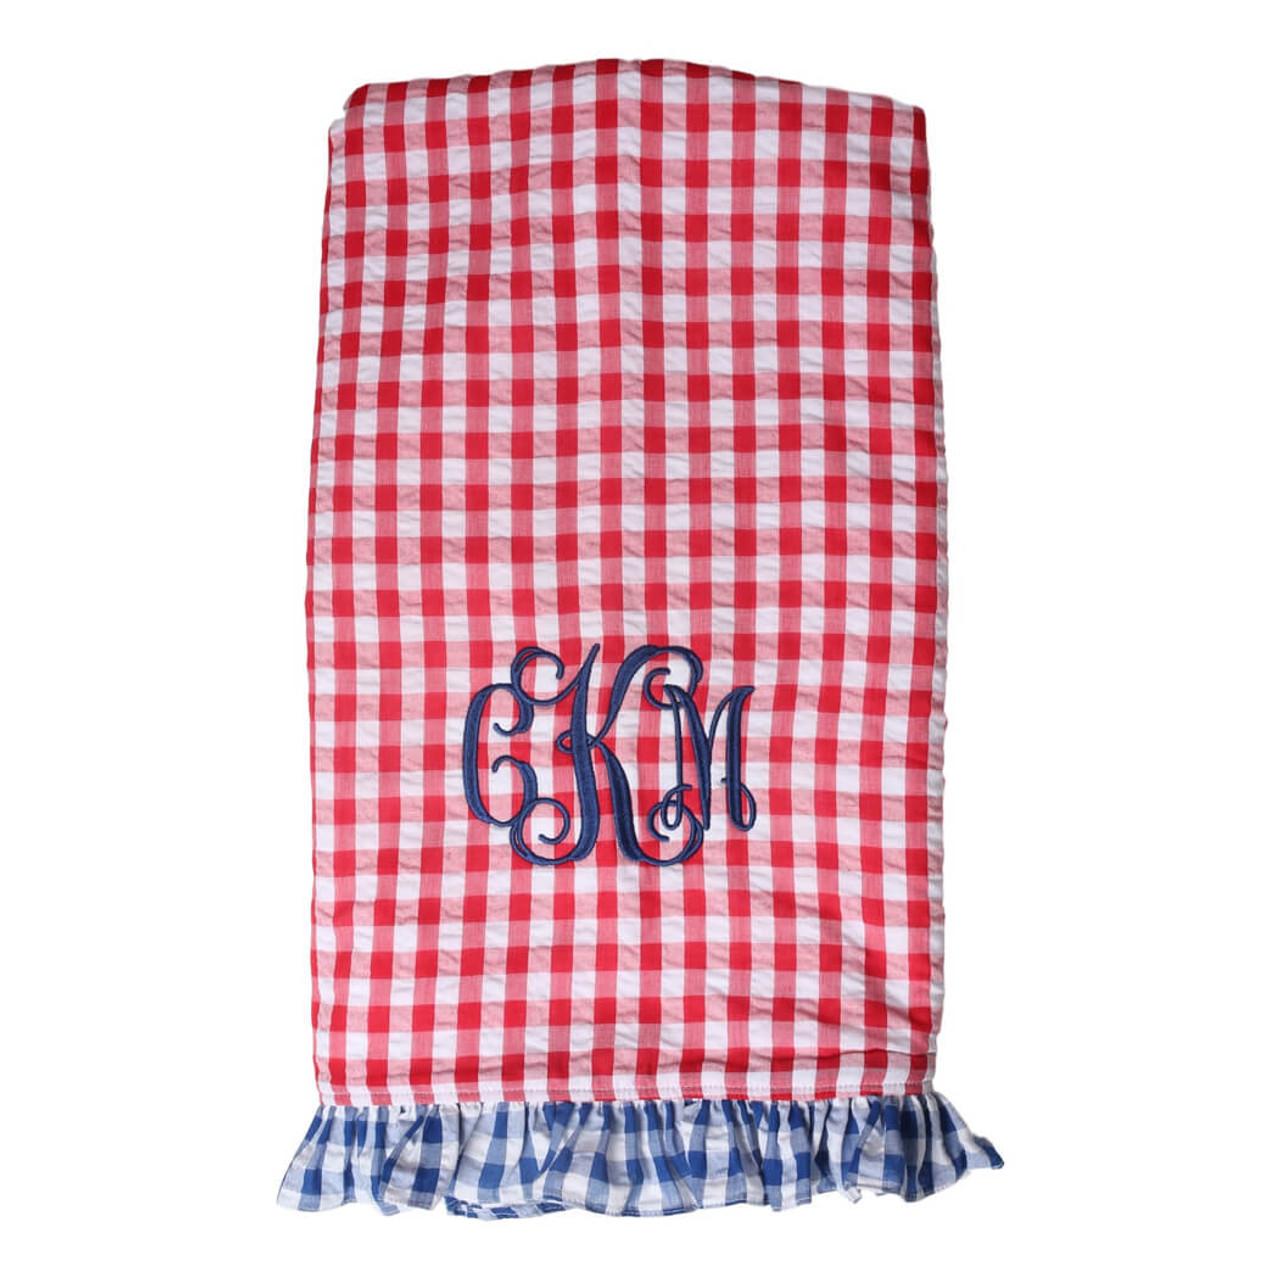 Red And Navy Check Ruffle Seersucker Beach Towel